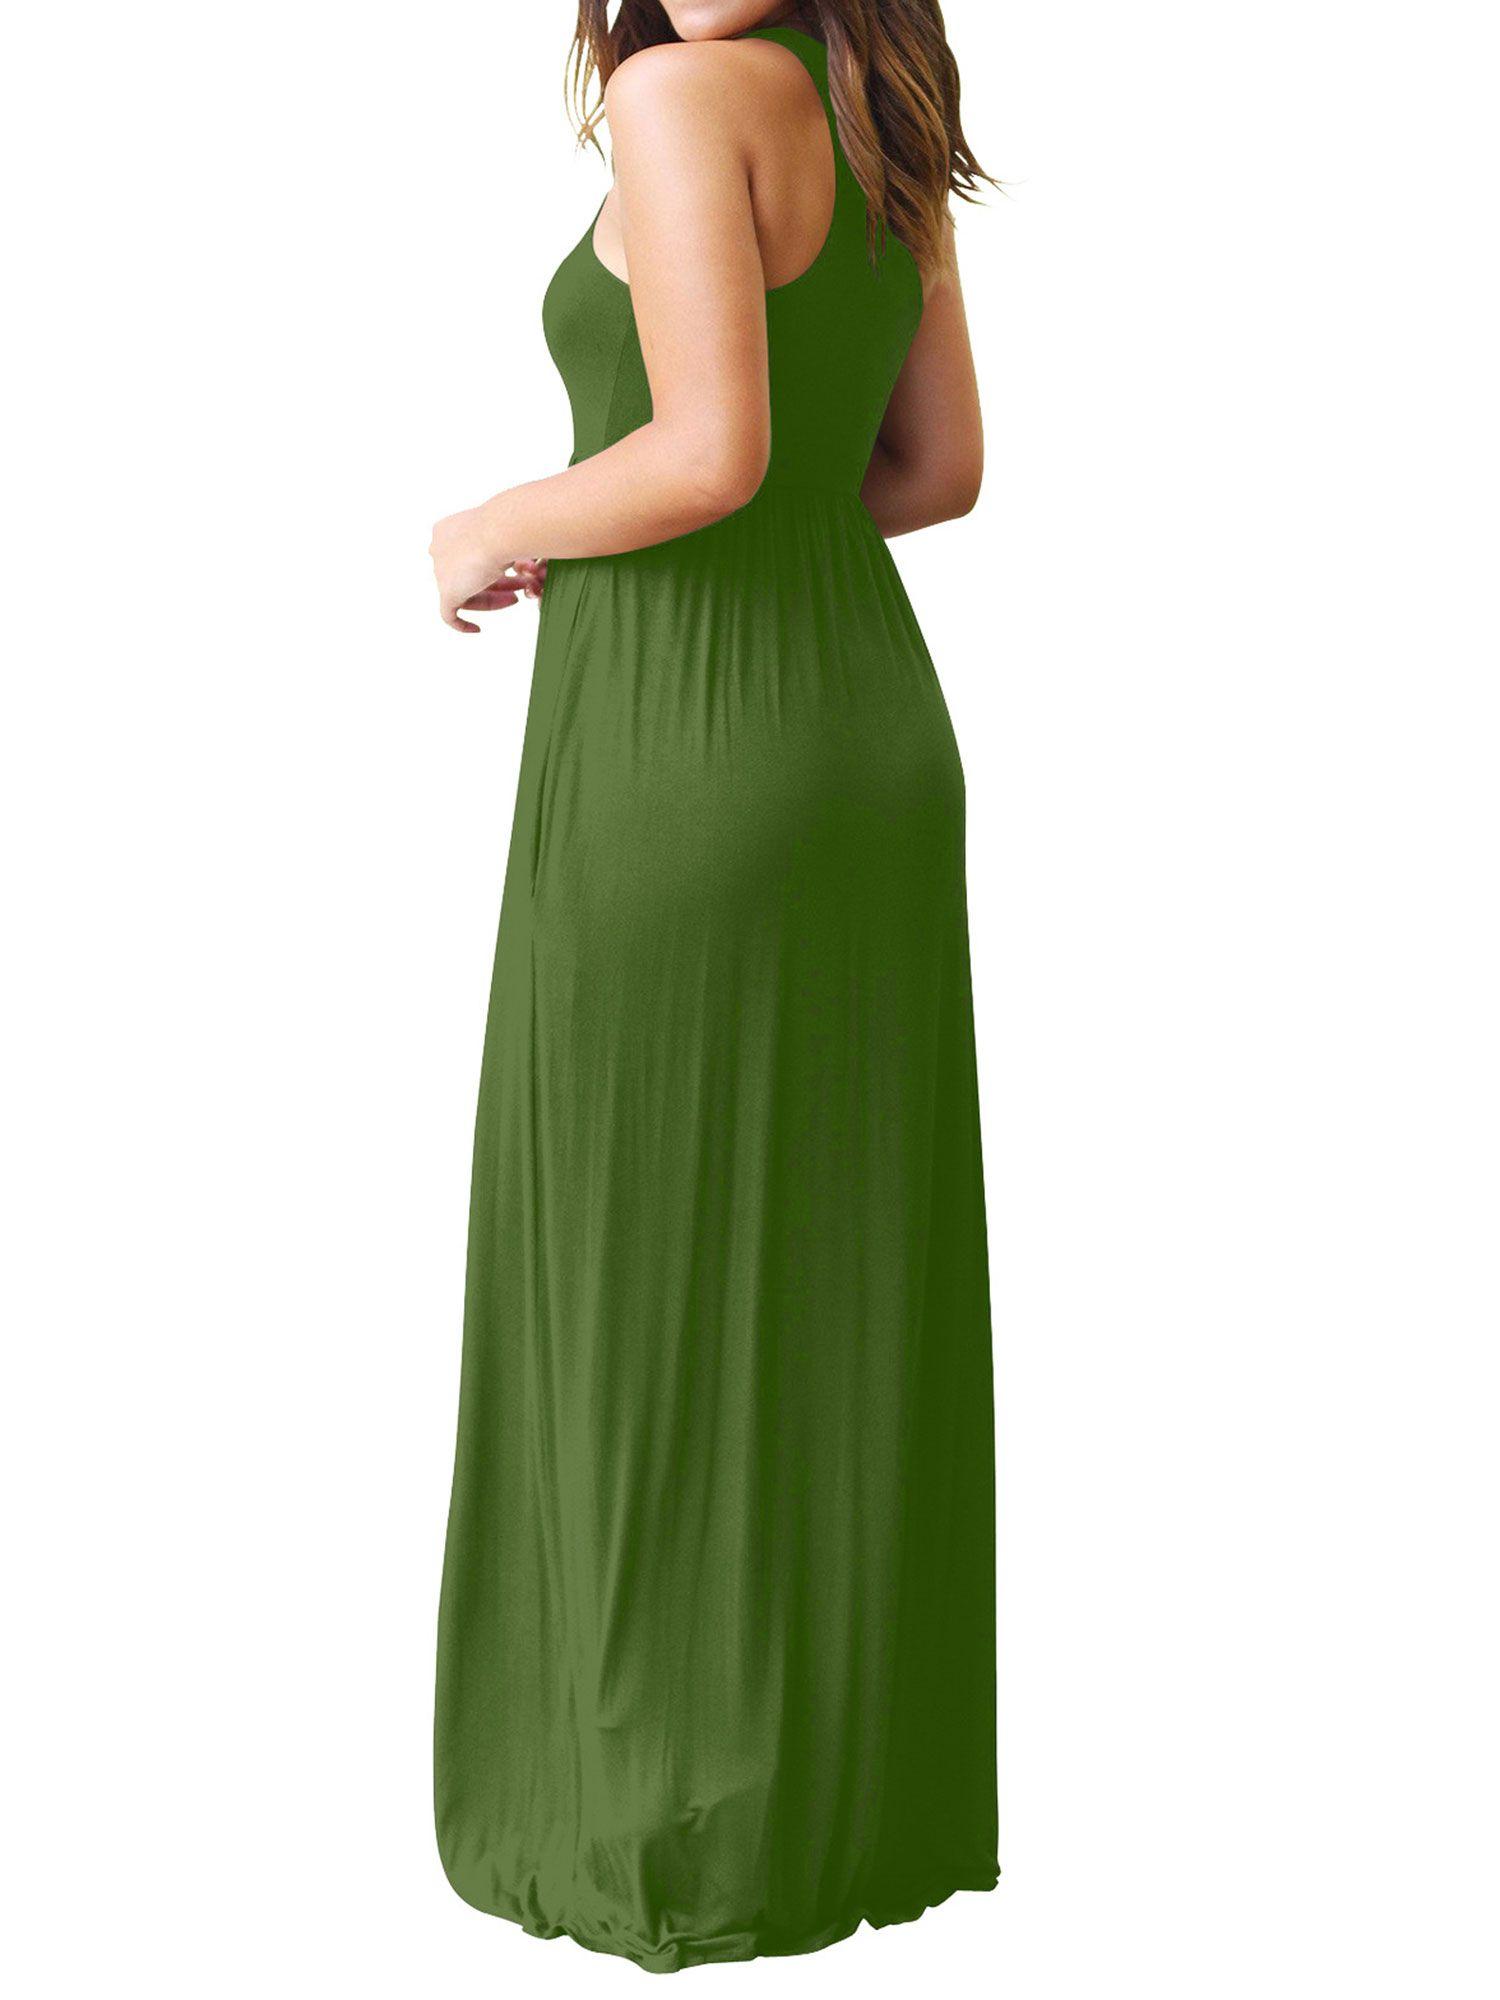 Zxzy Women Round Neck Sleeveless Pure Color Long Dress With Pocket Walmart Com Maxi Dresses Casual Maxi Tank Dress Long Dress Casual [ 2000 x 1500 Pixel ]